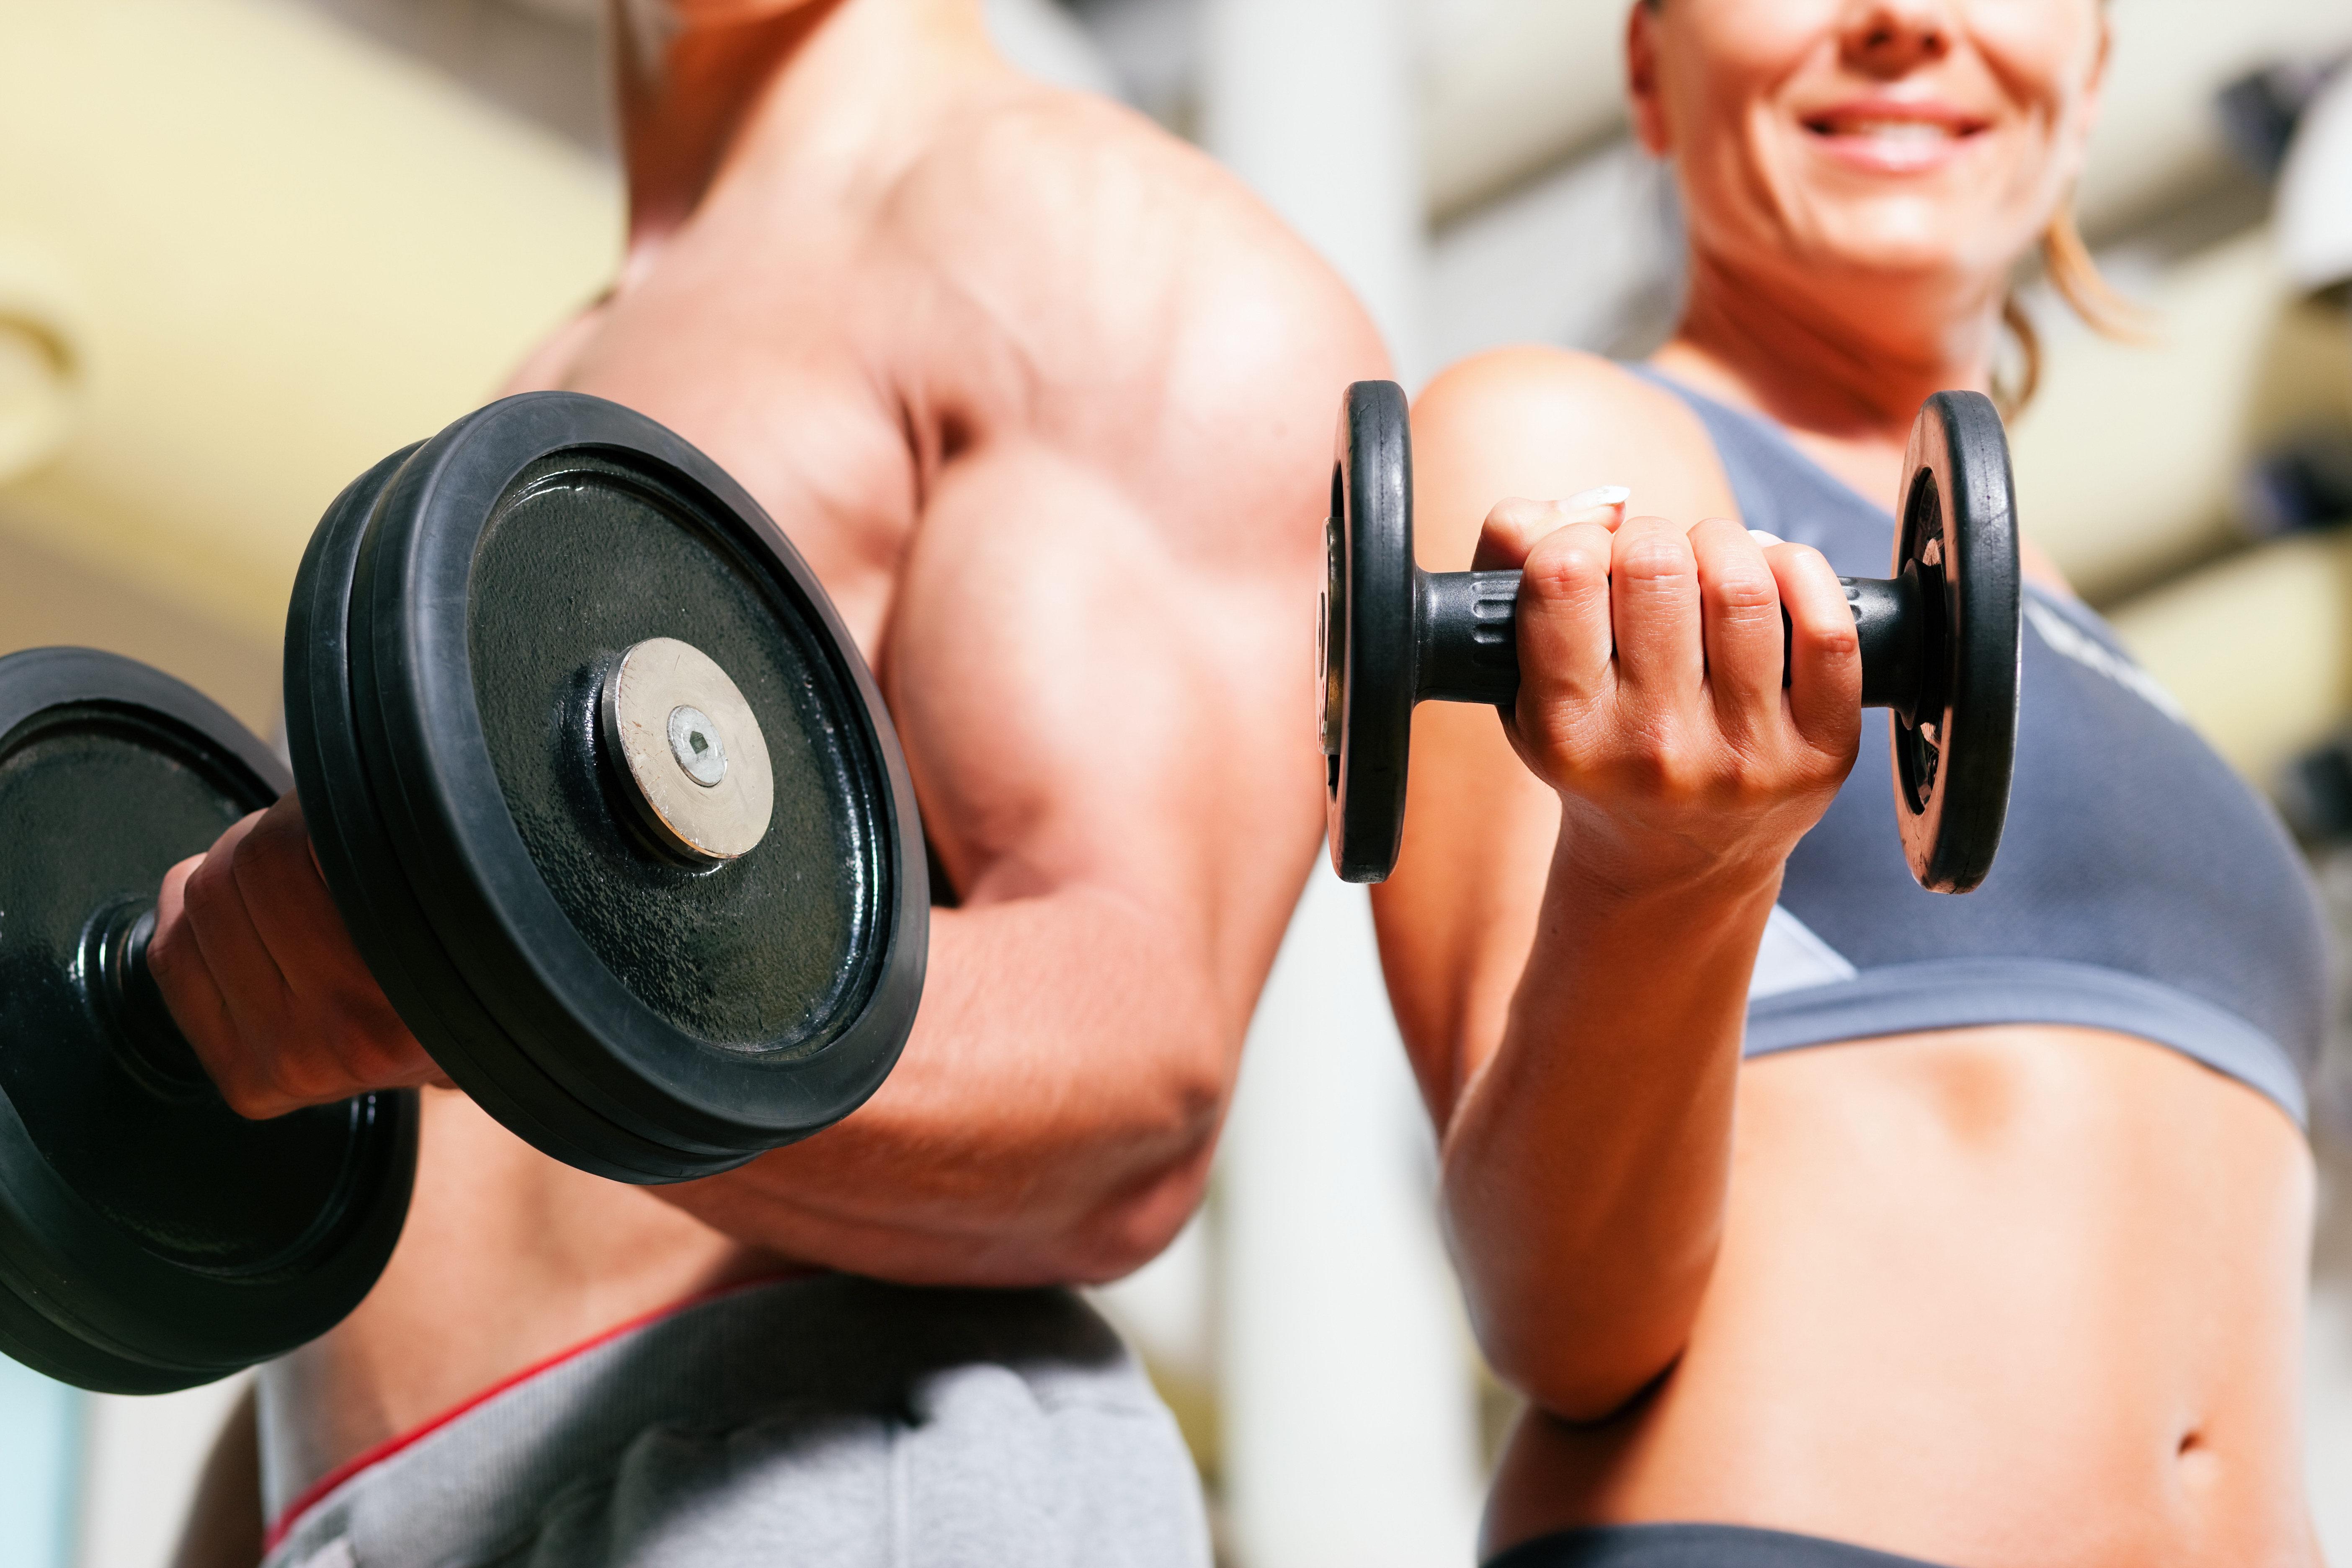 couple fitness widescreen wallpaper 51322